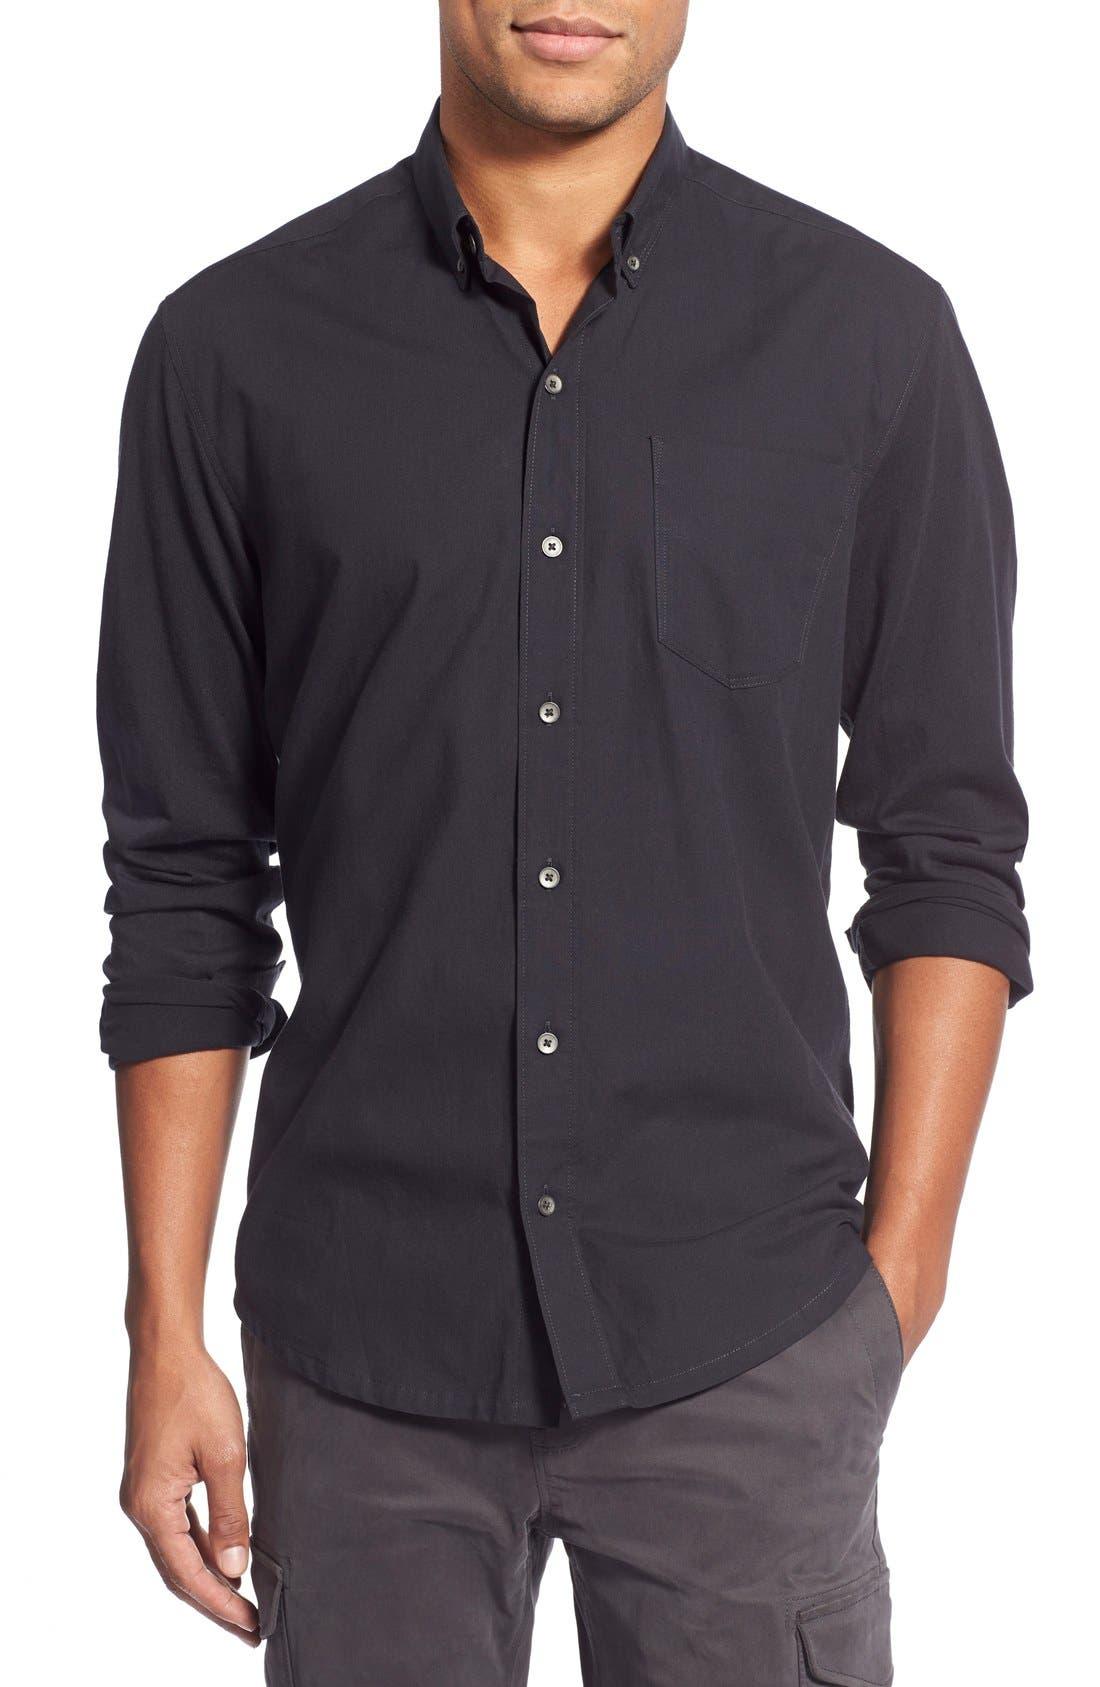 'Reworkd' Slim Fit Solid Mixed Media Sport Shirt,                             Main thumbnail 1, color,                             001